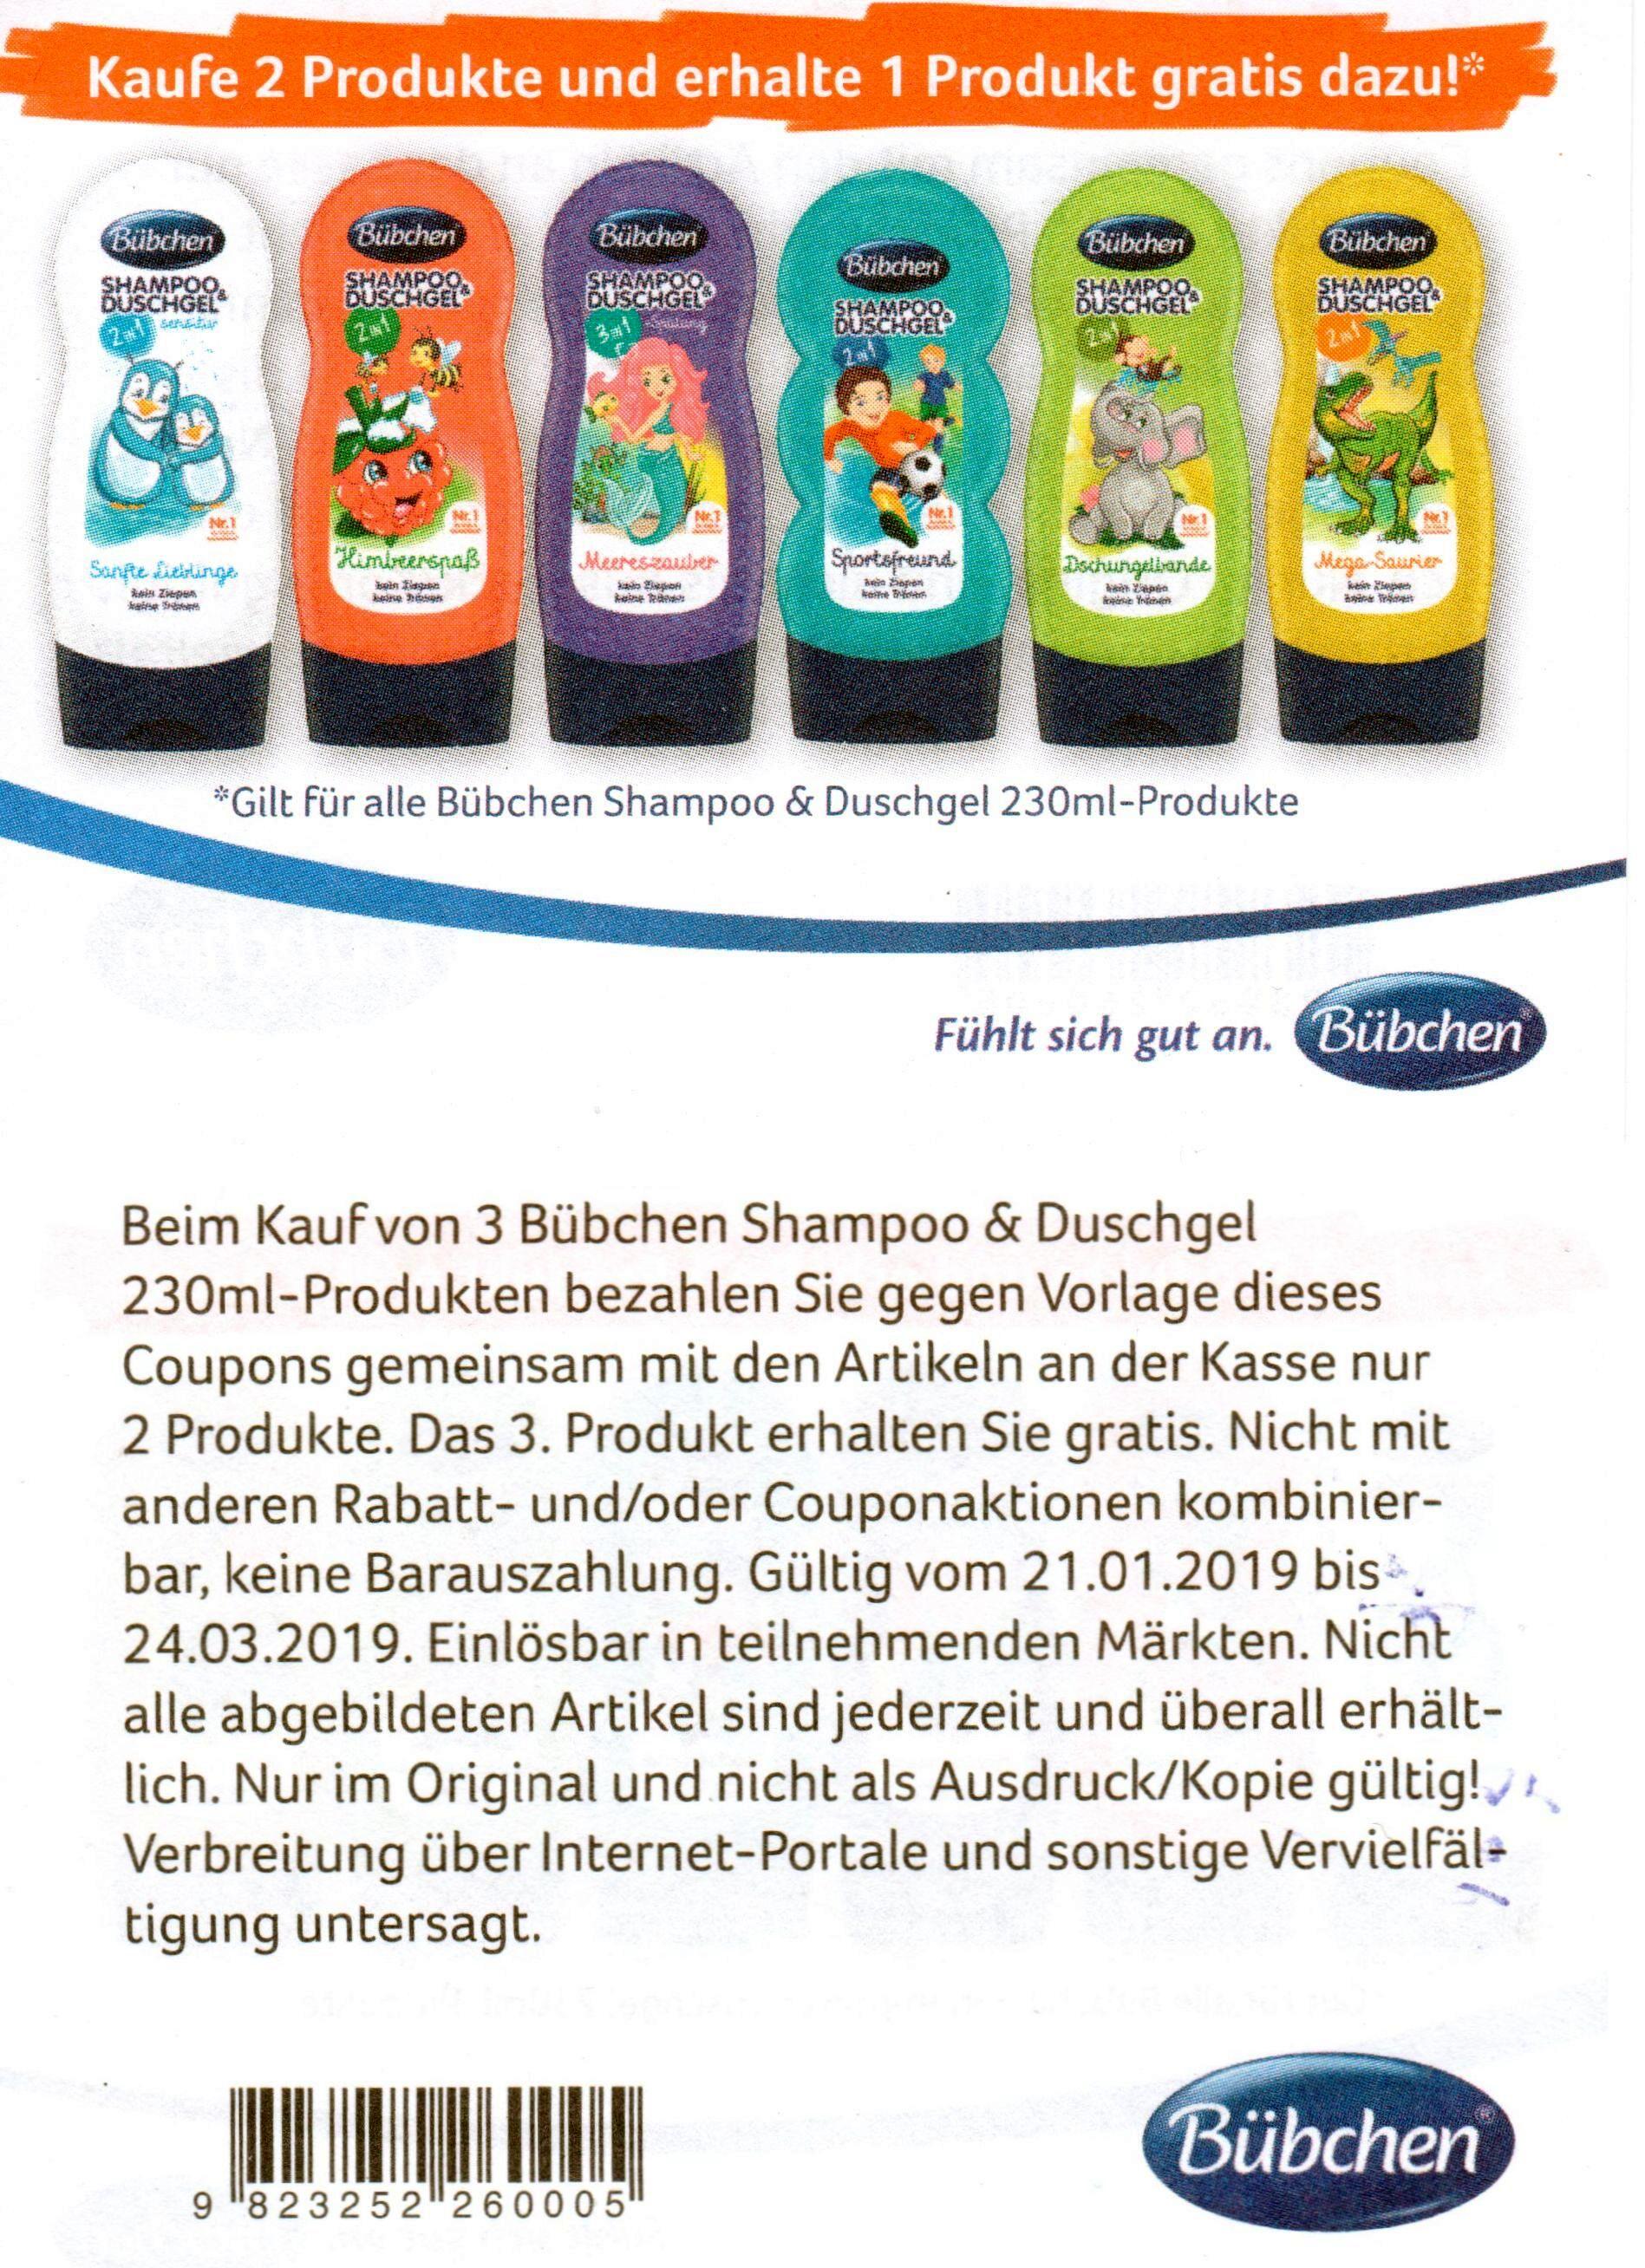 2+1 Coupon für Bübchen Shampoo & Duschgel 230ml